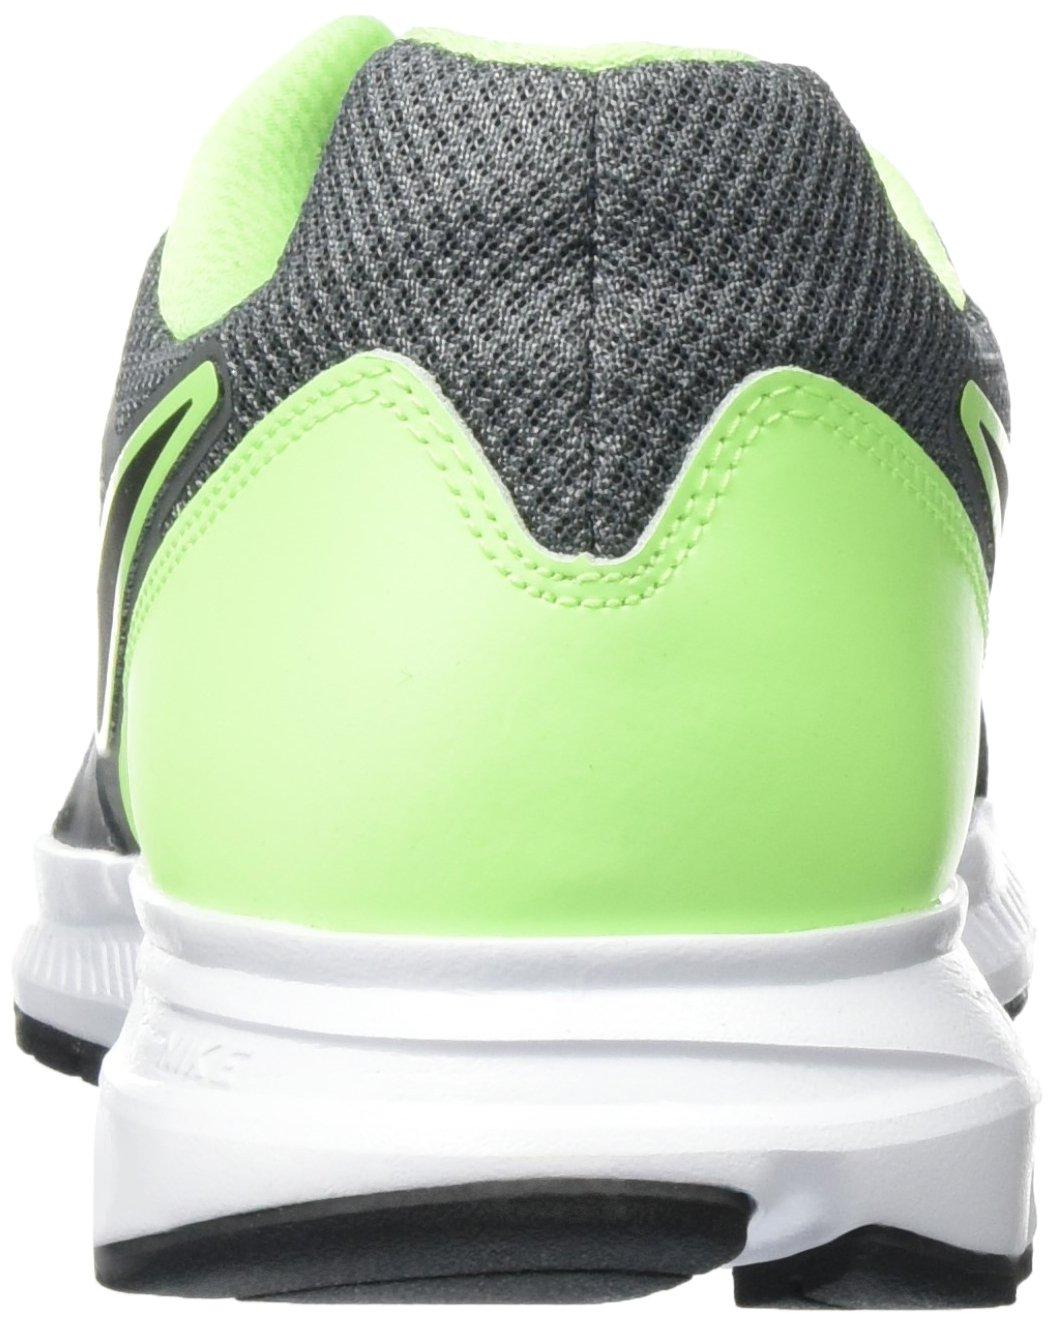 Nike Downshifter 6, Scarpe da Ginnastica Uomo FACESHOPPING